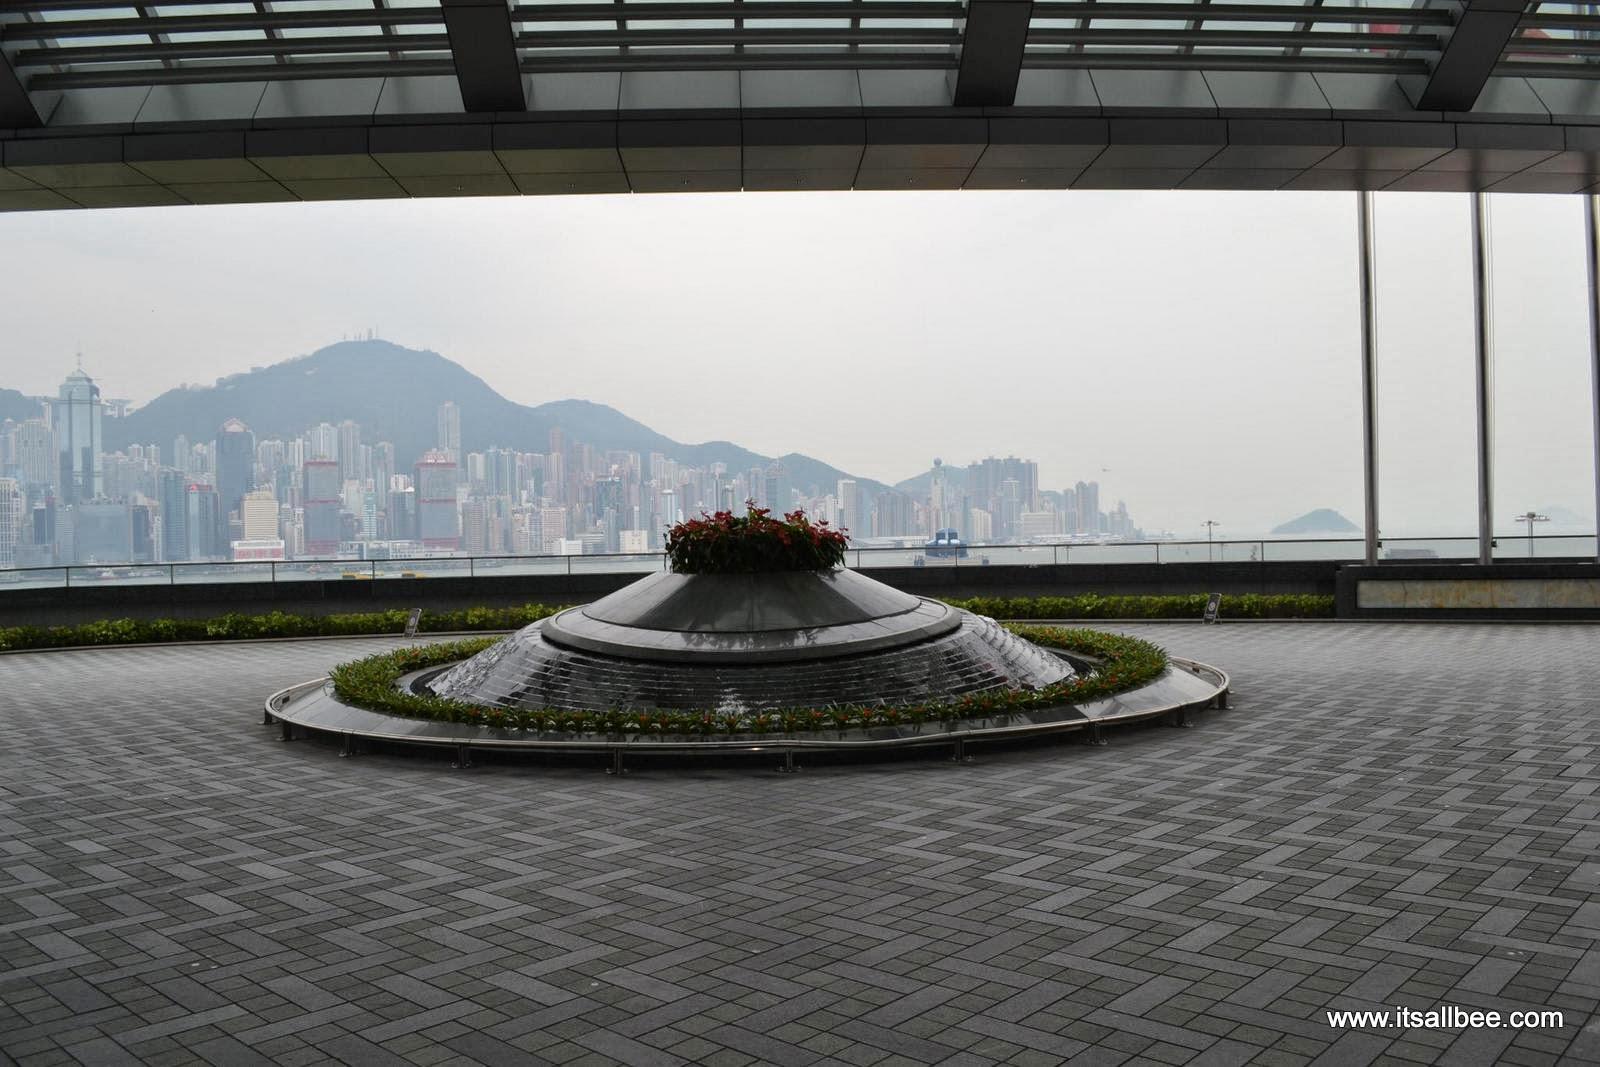 Hong Kong: Lunch Date at Ritz Carlton CAFE 101